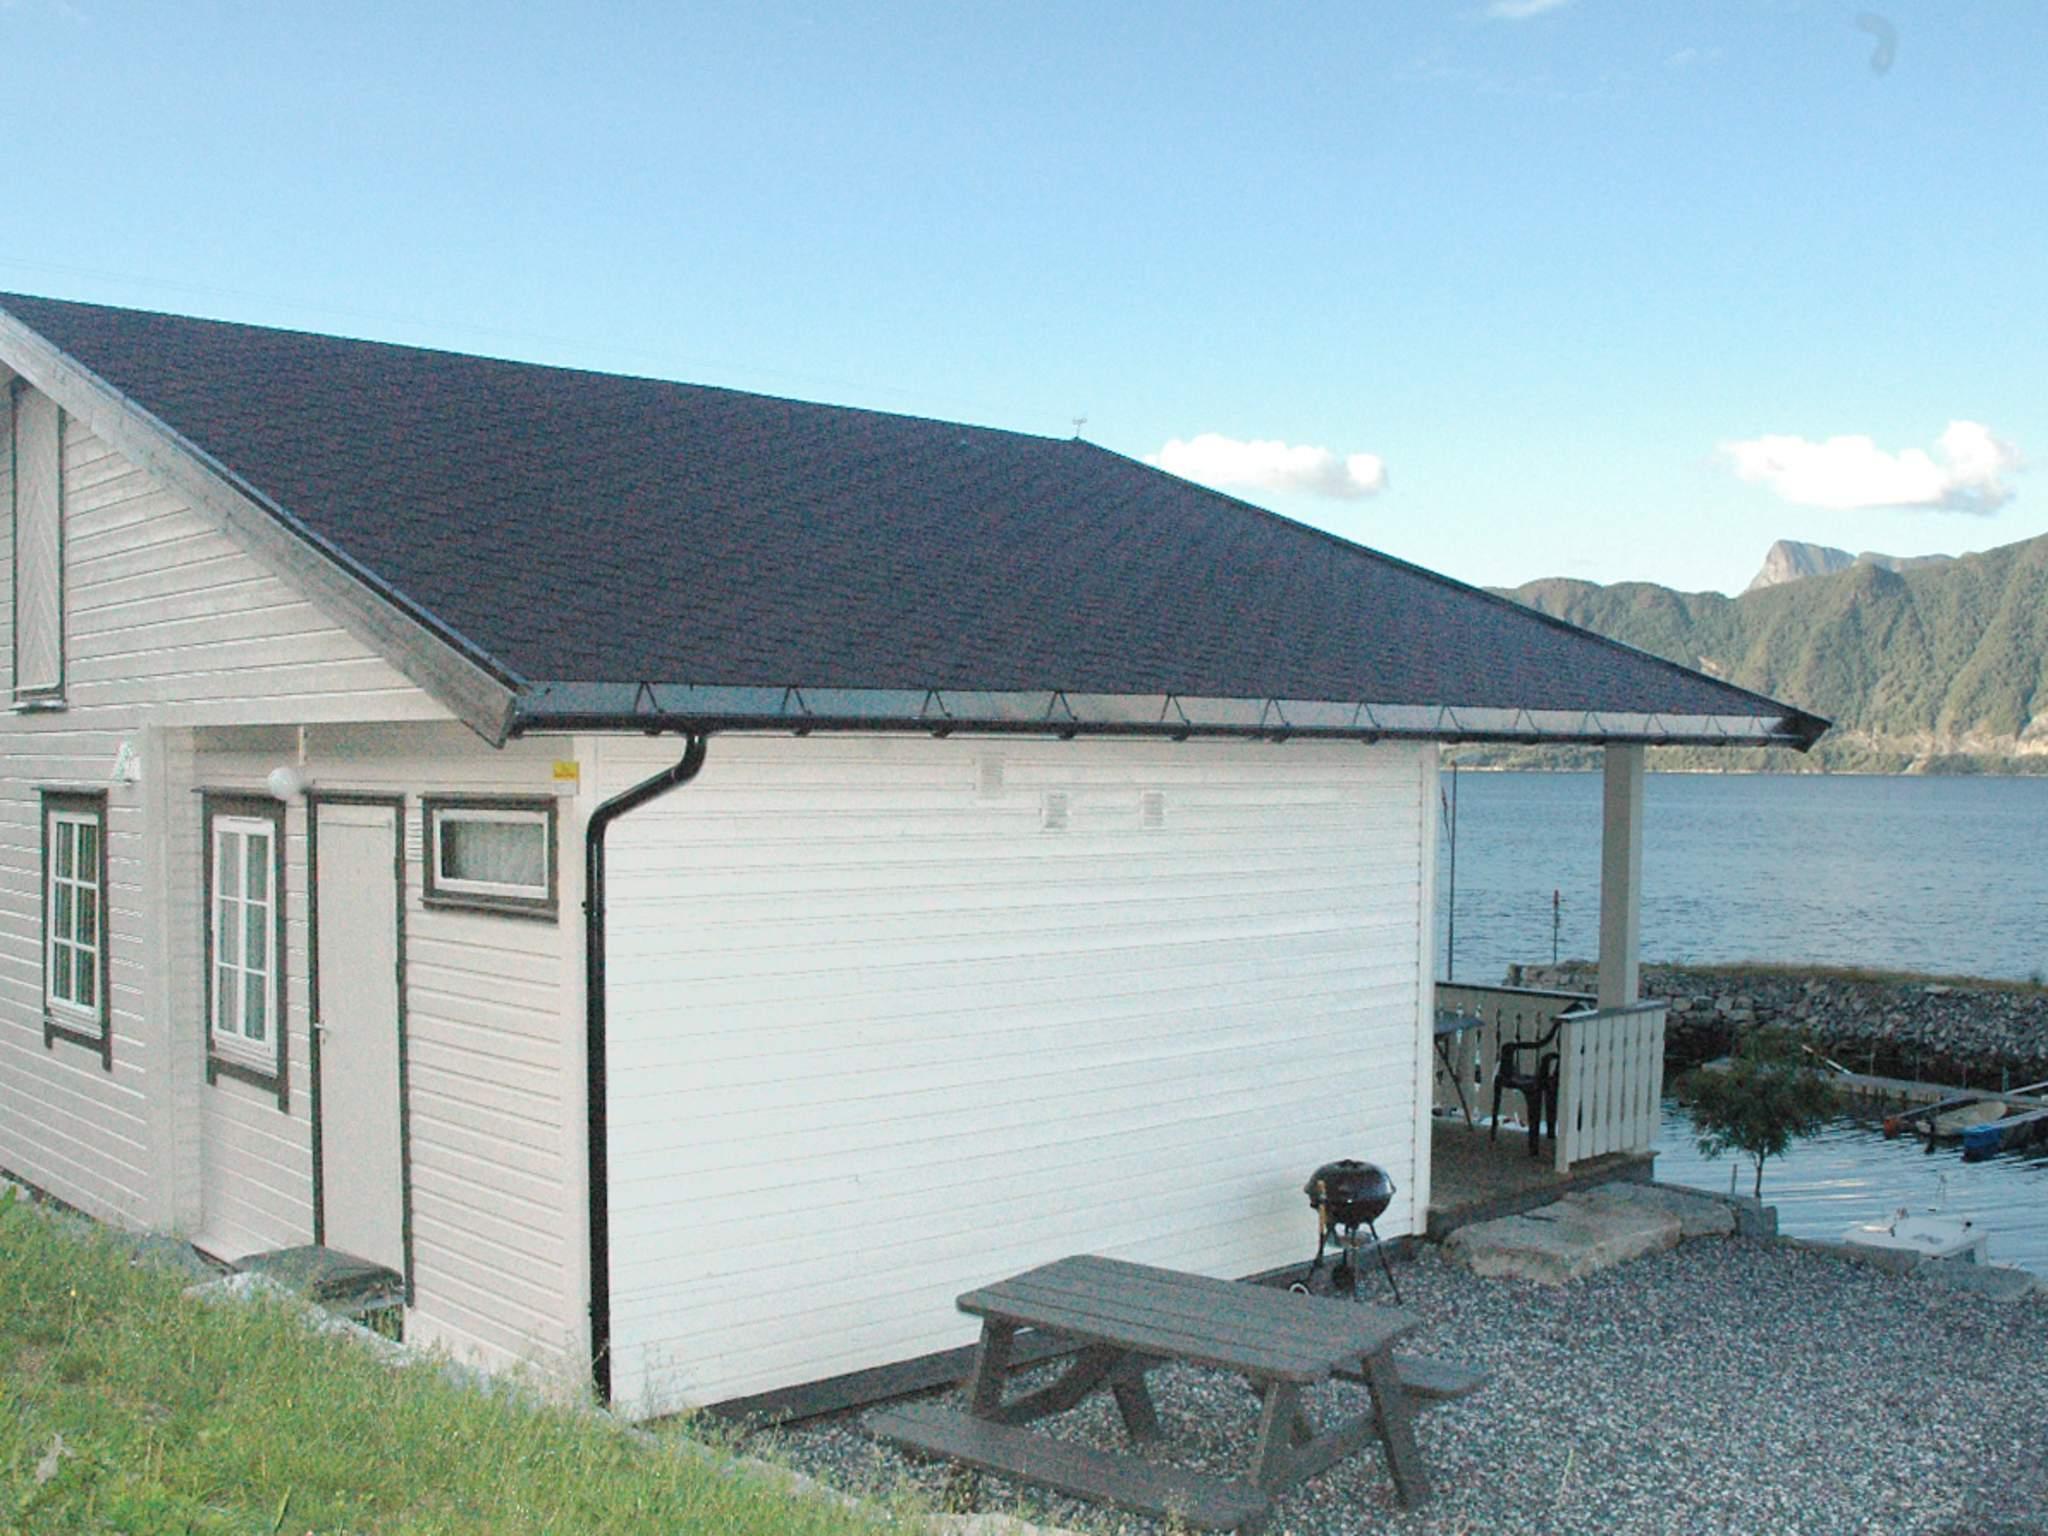 Ferienhaus Lauvstad (276049), Lauvstad, More - Romsdal, Westnorwegen, Norwegen, Bild 21